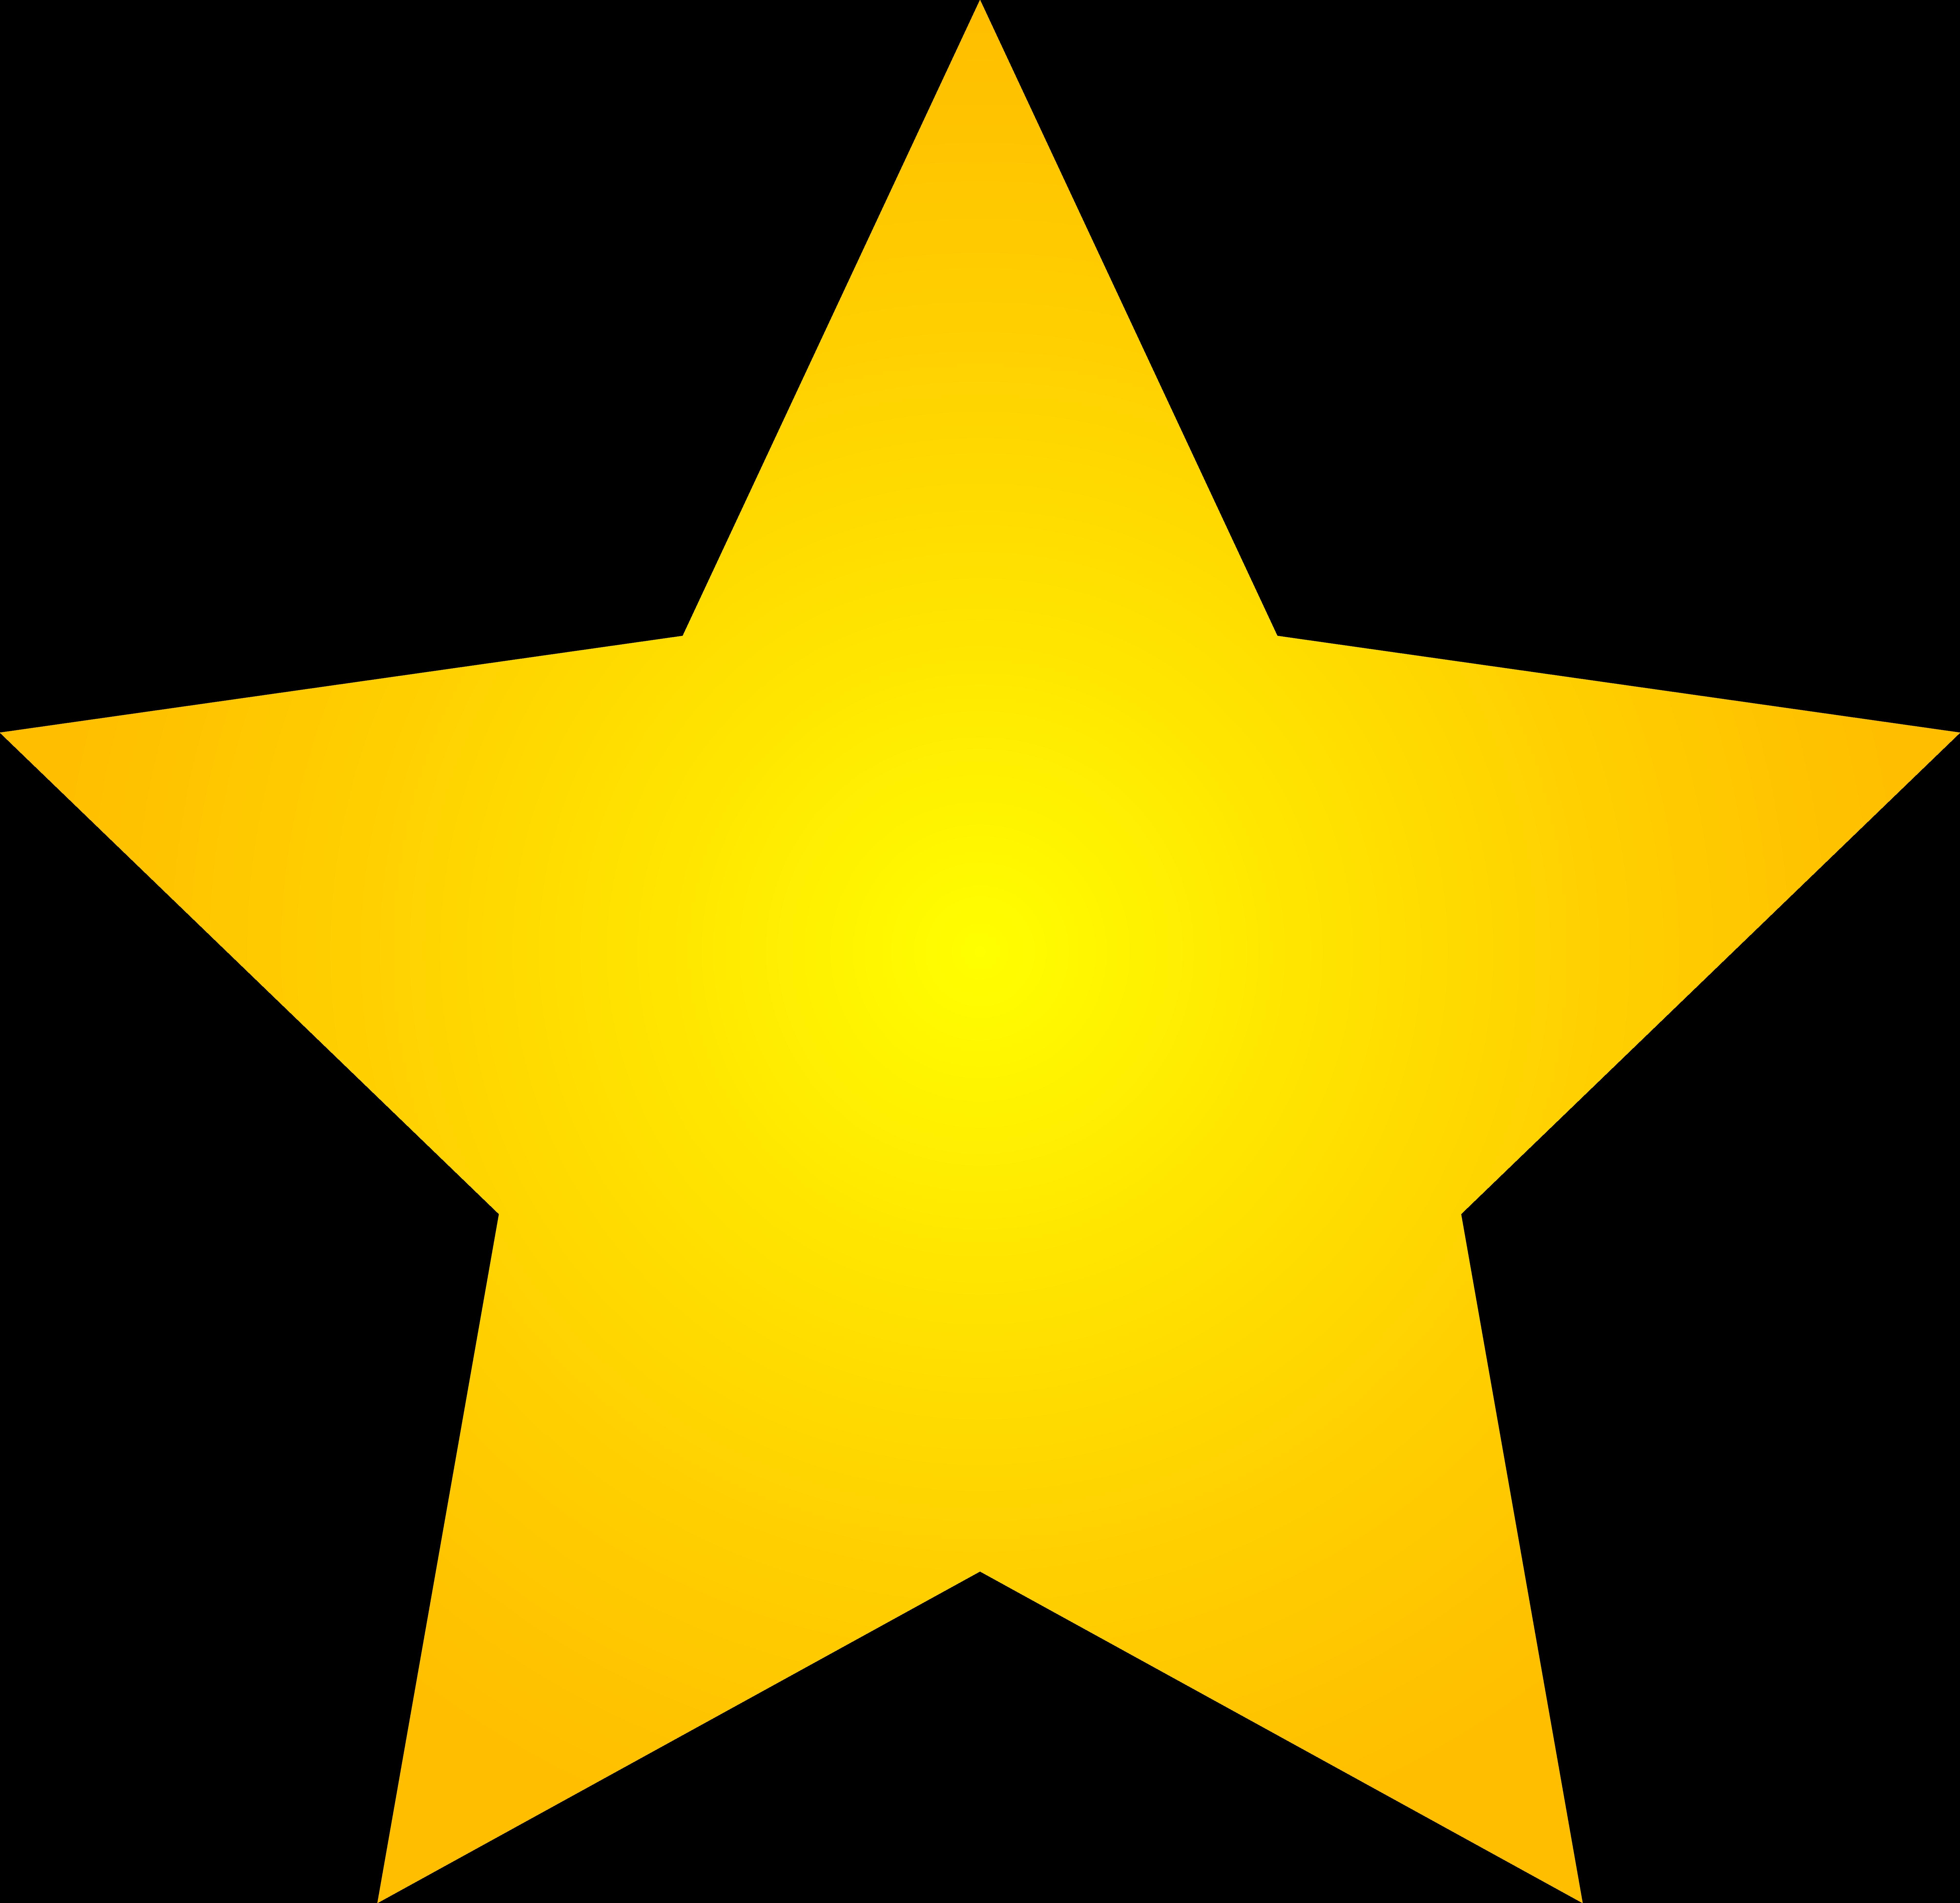 Black Star Cliparts - Cliparts Zone jpg transparent